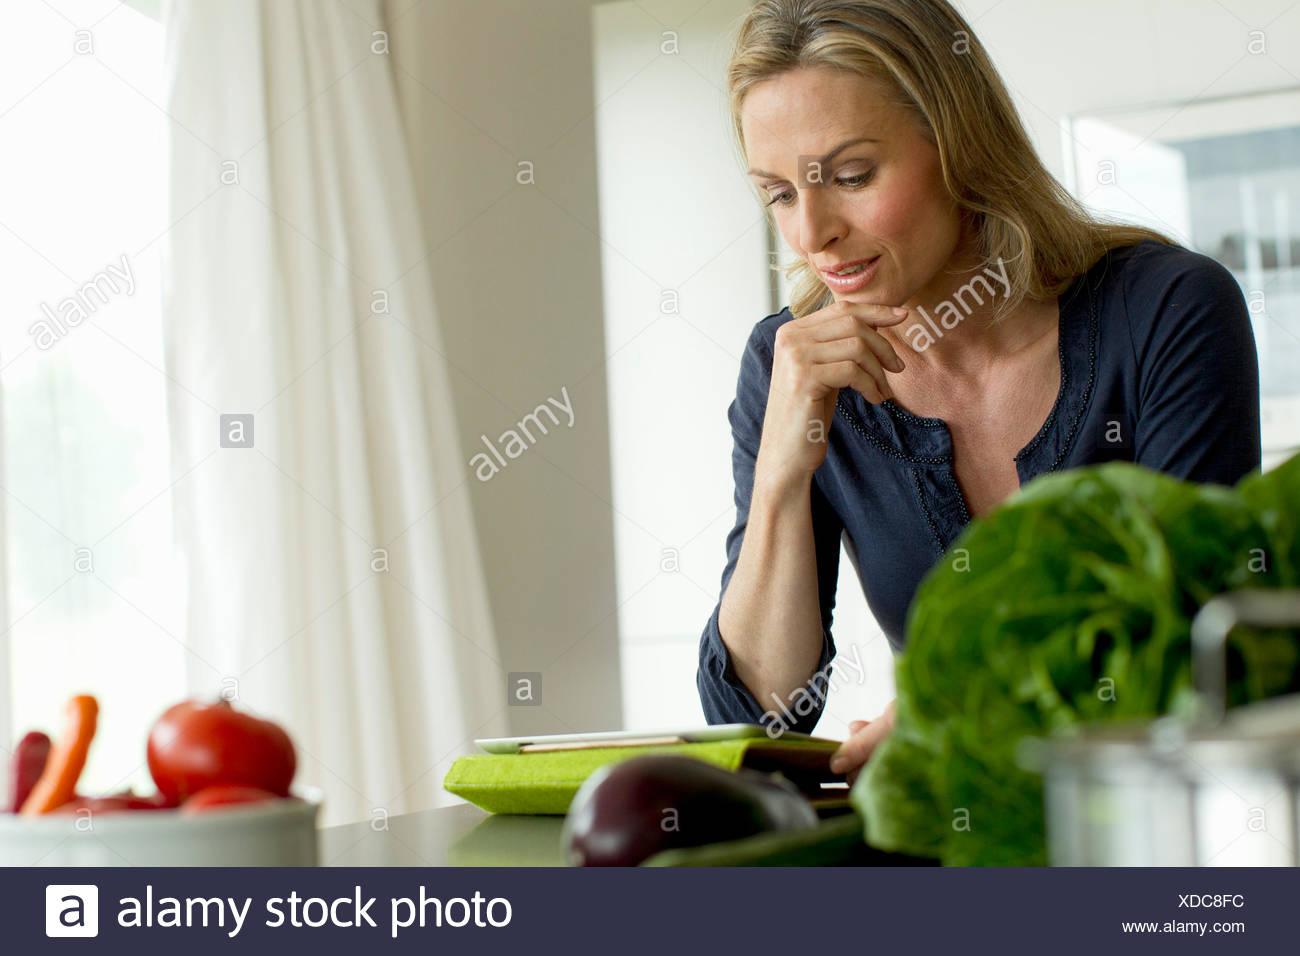 Mature woman using digital tablet - Stock Image